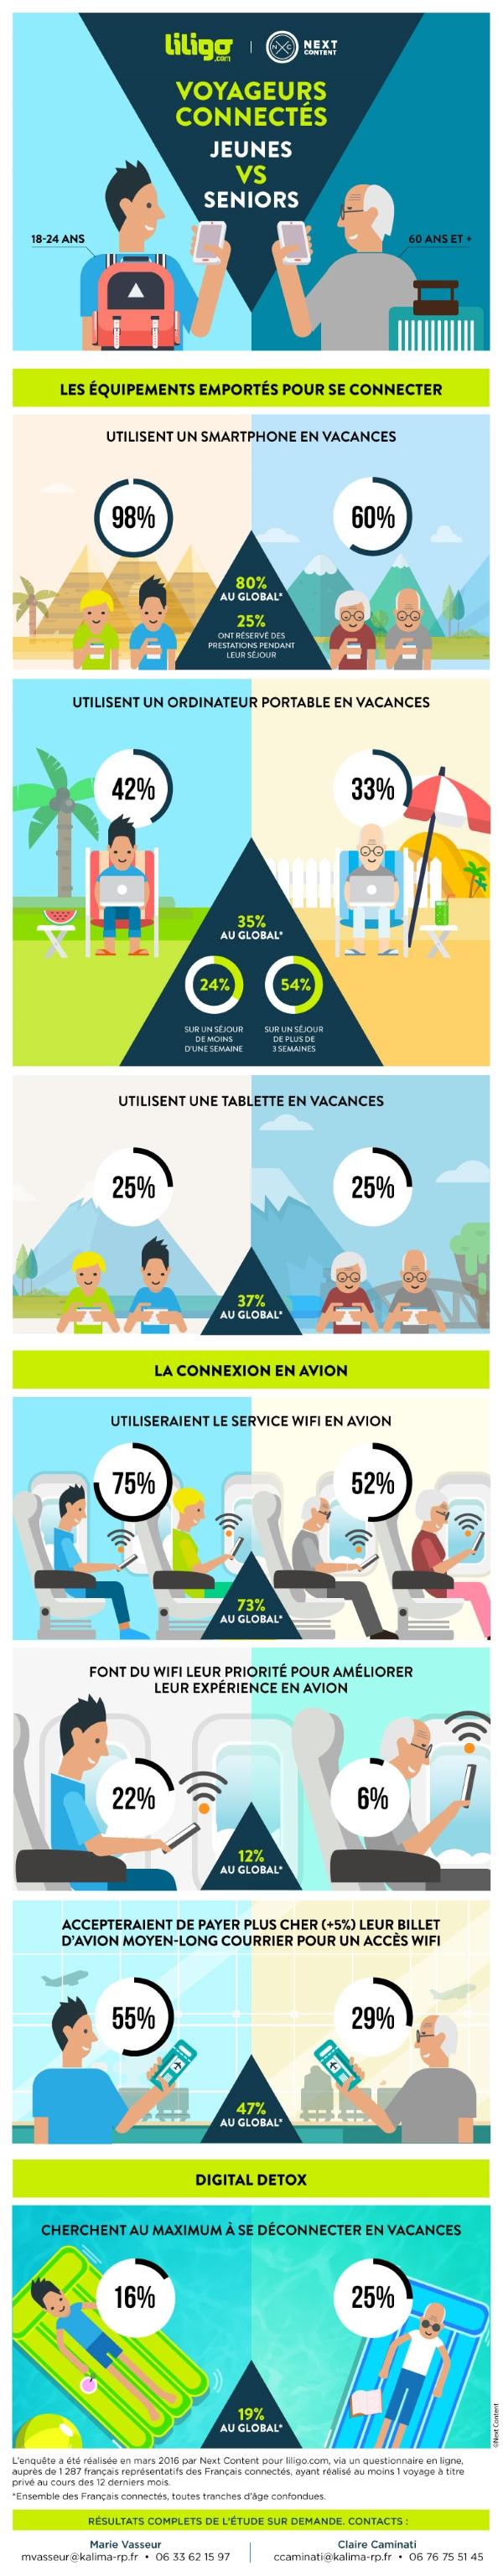 voyageurs-connectes-jeunes-vs-seniors_LILIGO.com (2)